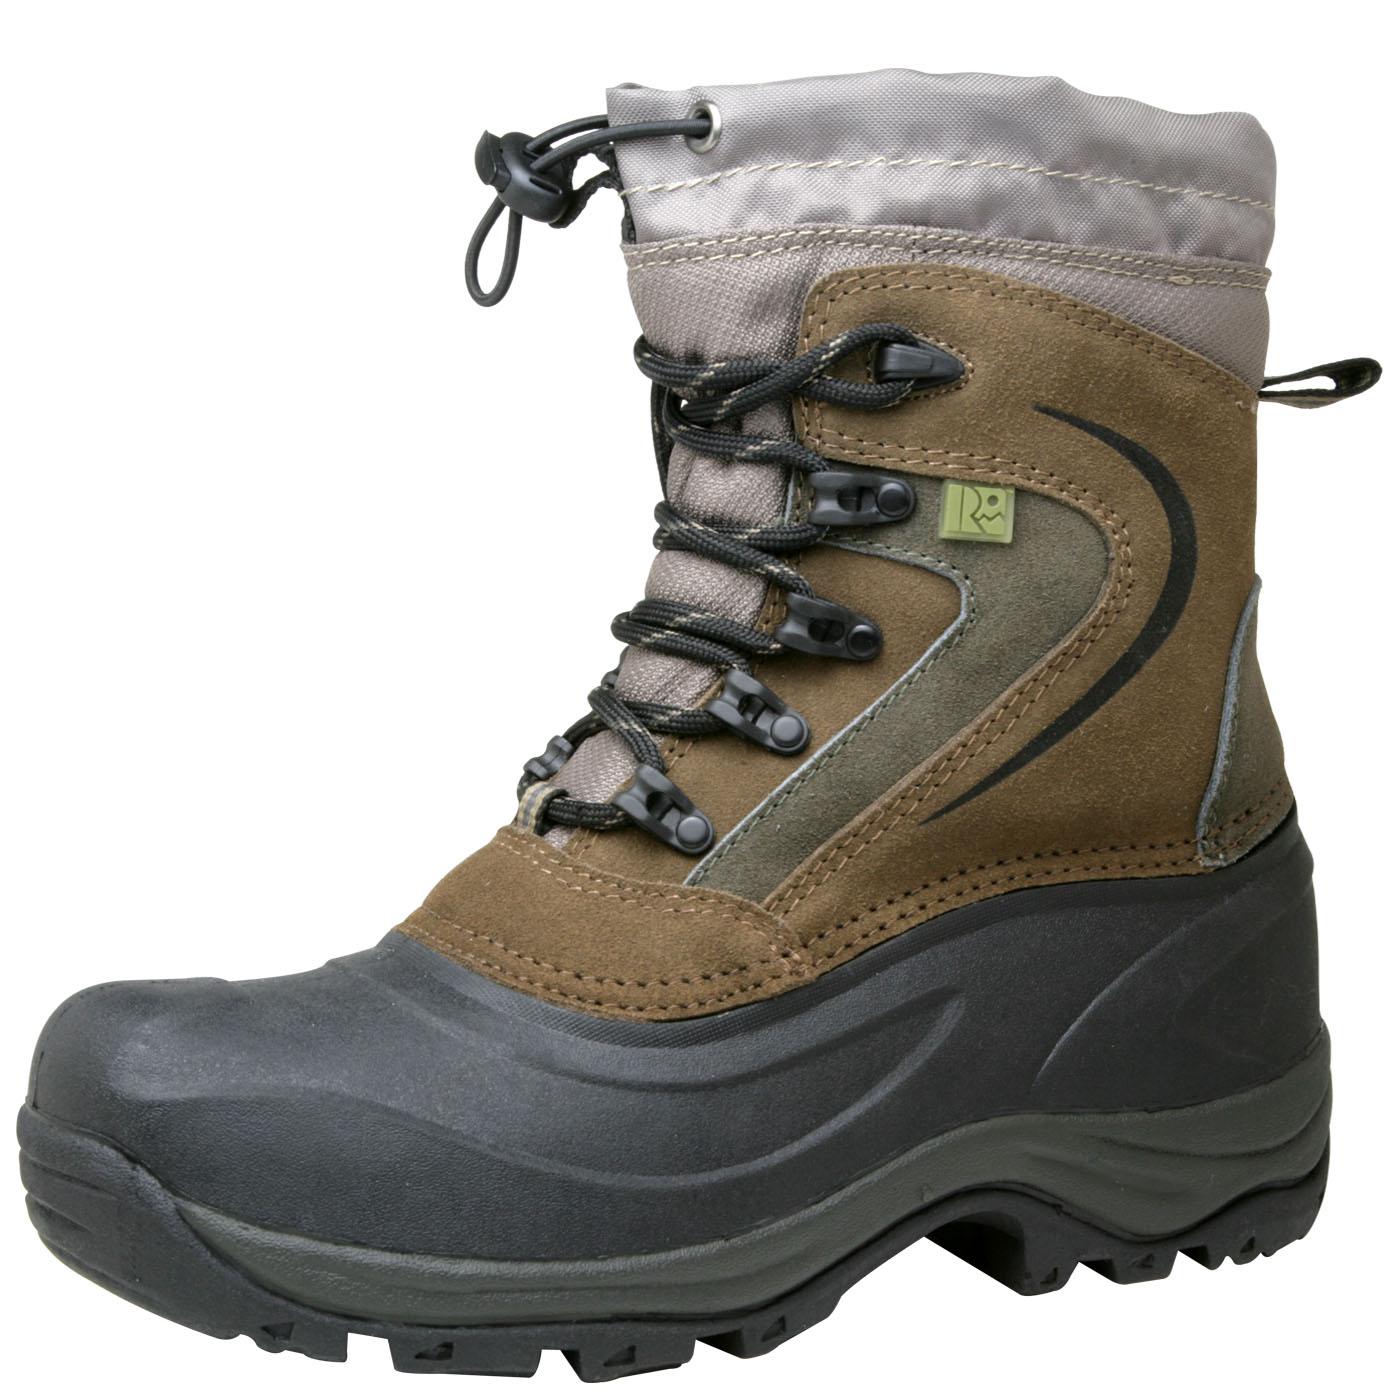 mens waterproof boots menu0027s apex leather waterproof bootmenu0027s apex leather waterproof boot, tan crikznc